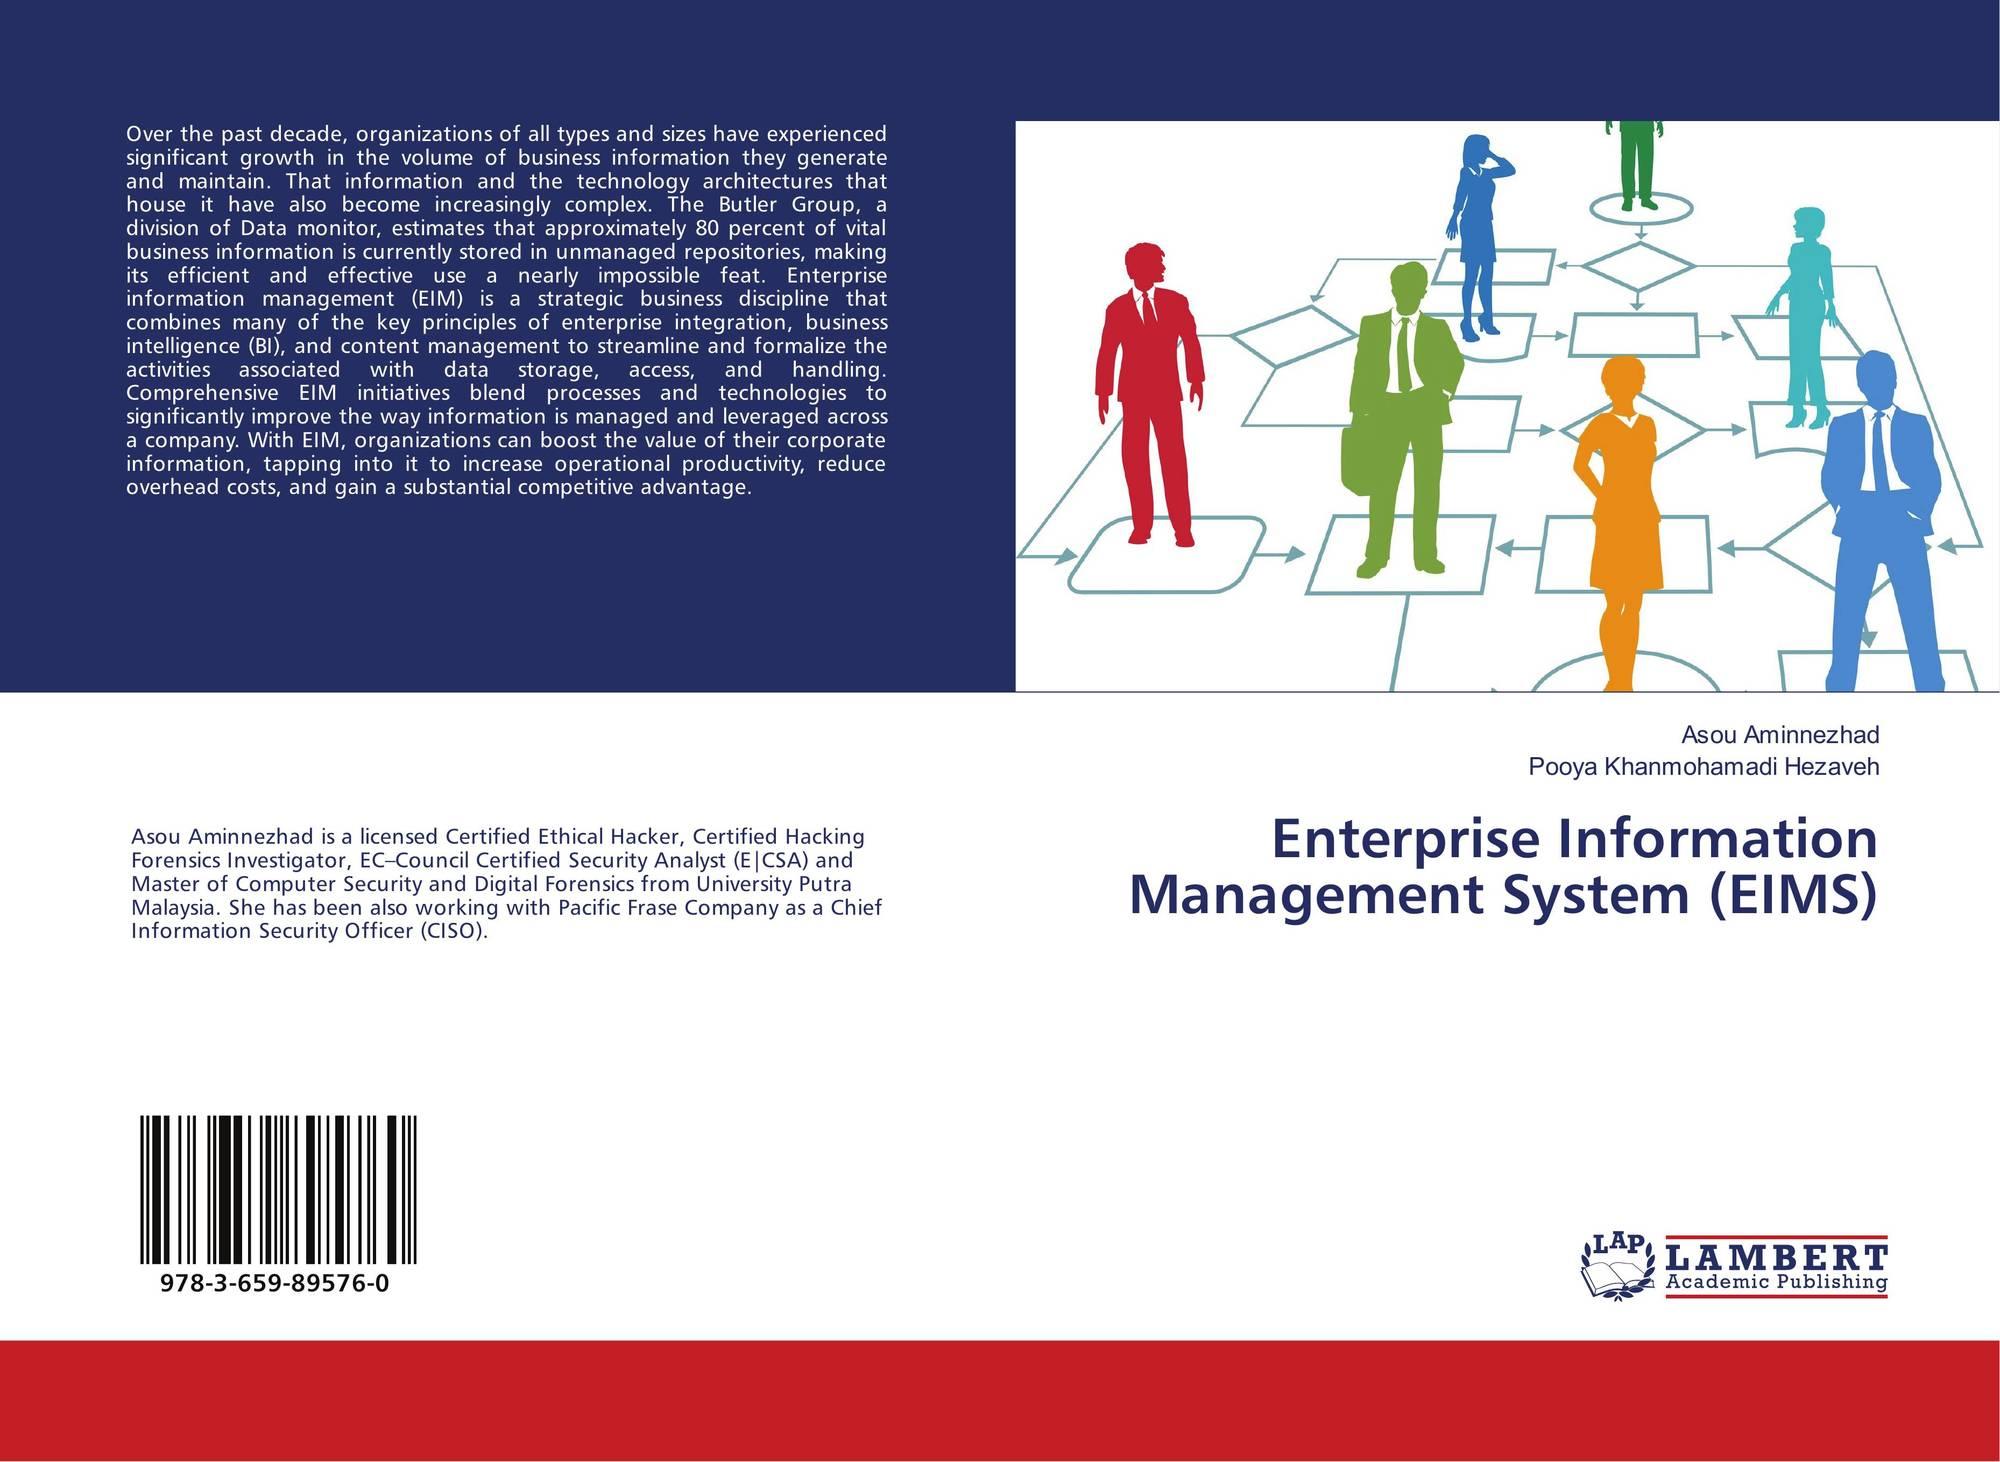 enterprise information management 1 build and execute an enterprise information management (eim) strategy m  joe zhou kamal parekh md/dama international, san diego, ca march 2008.